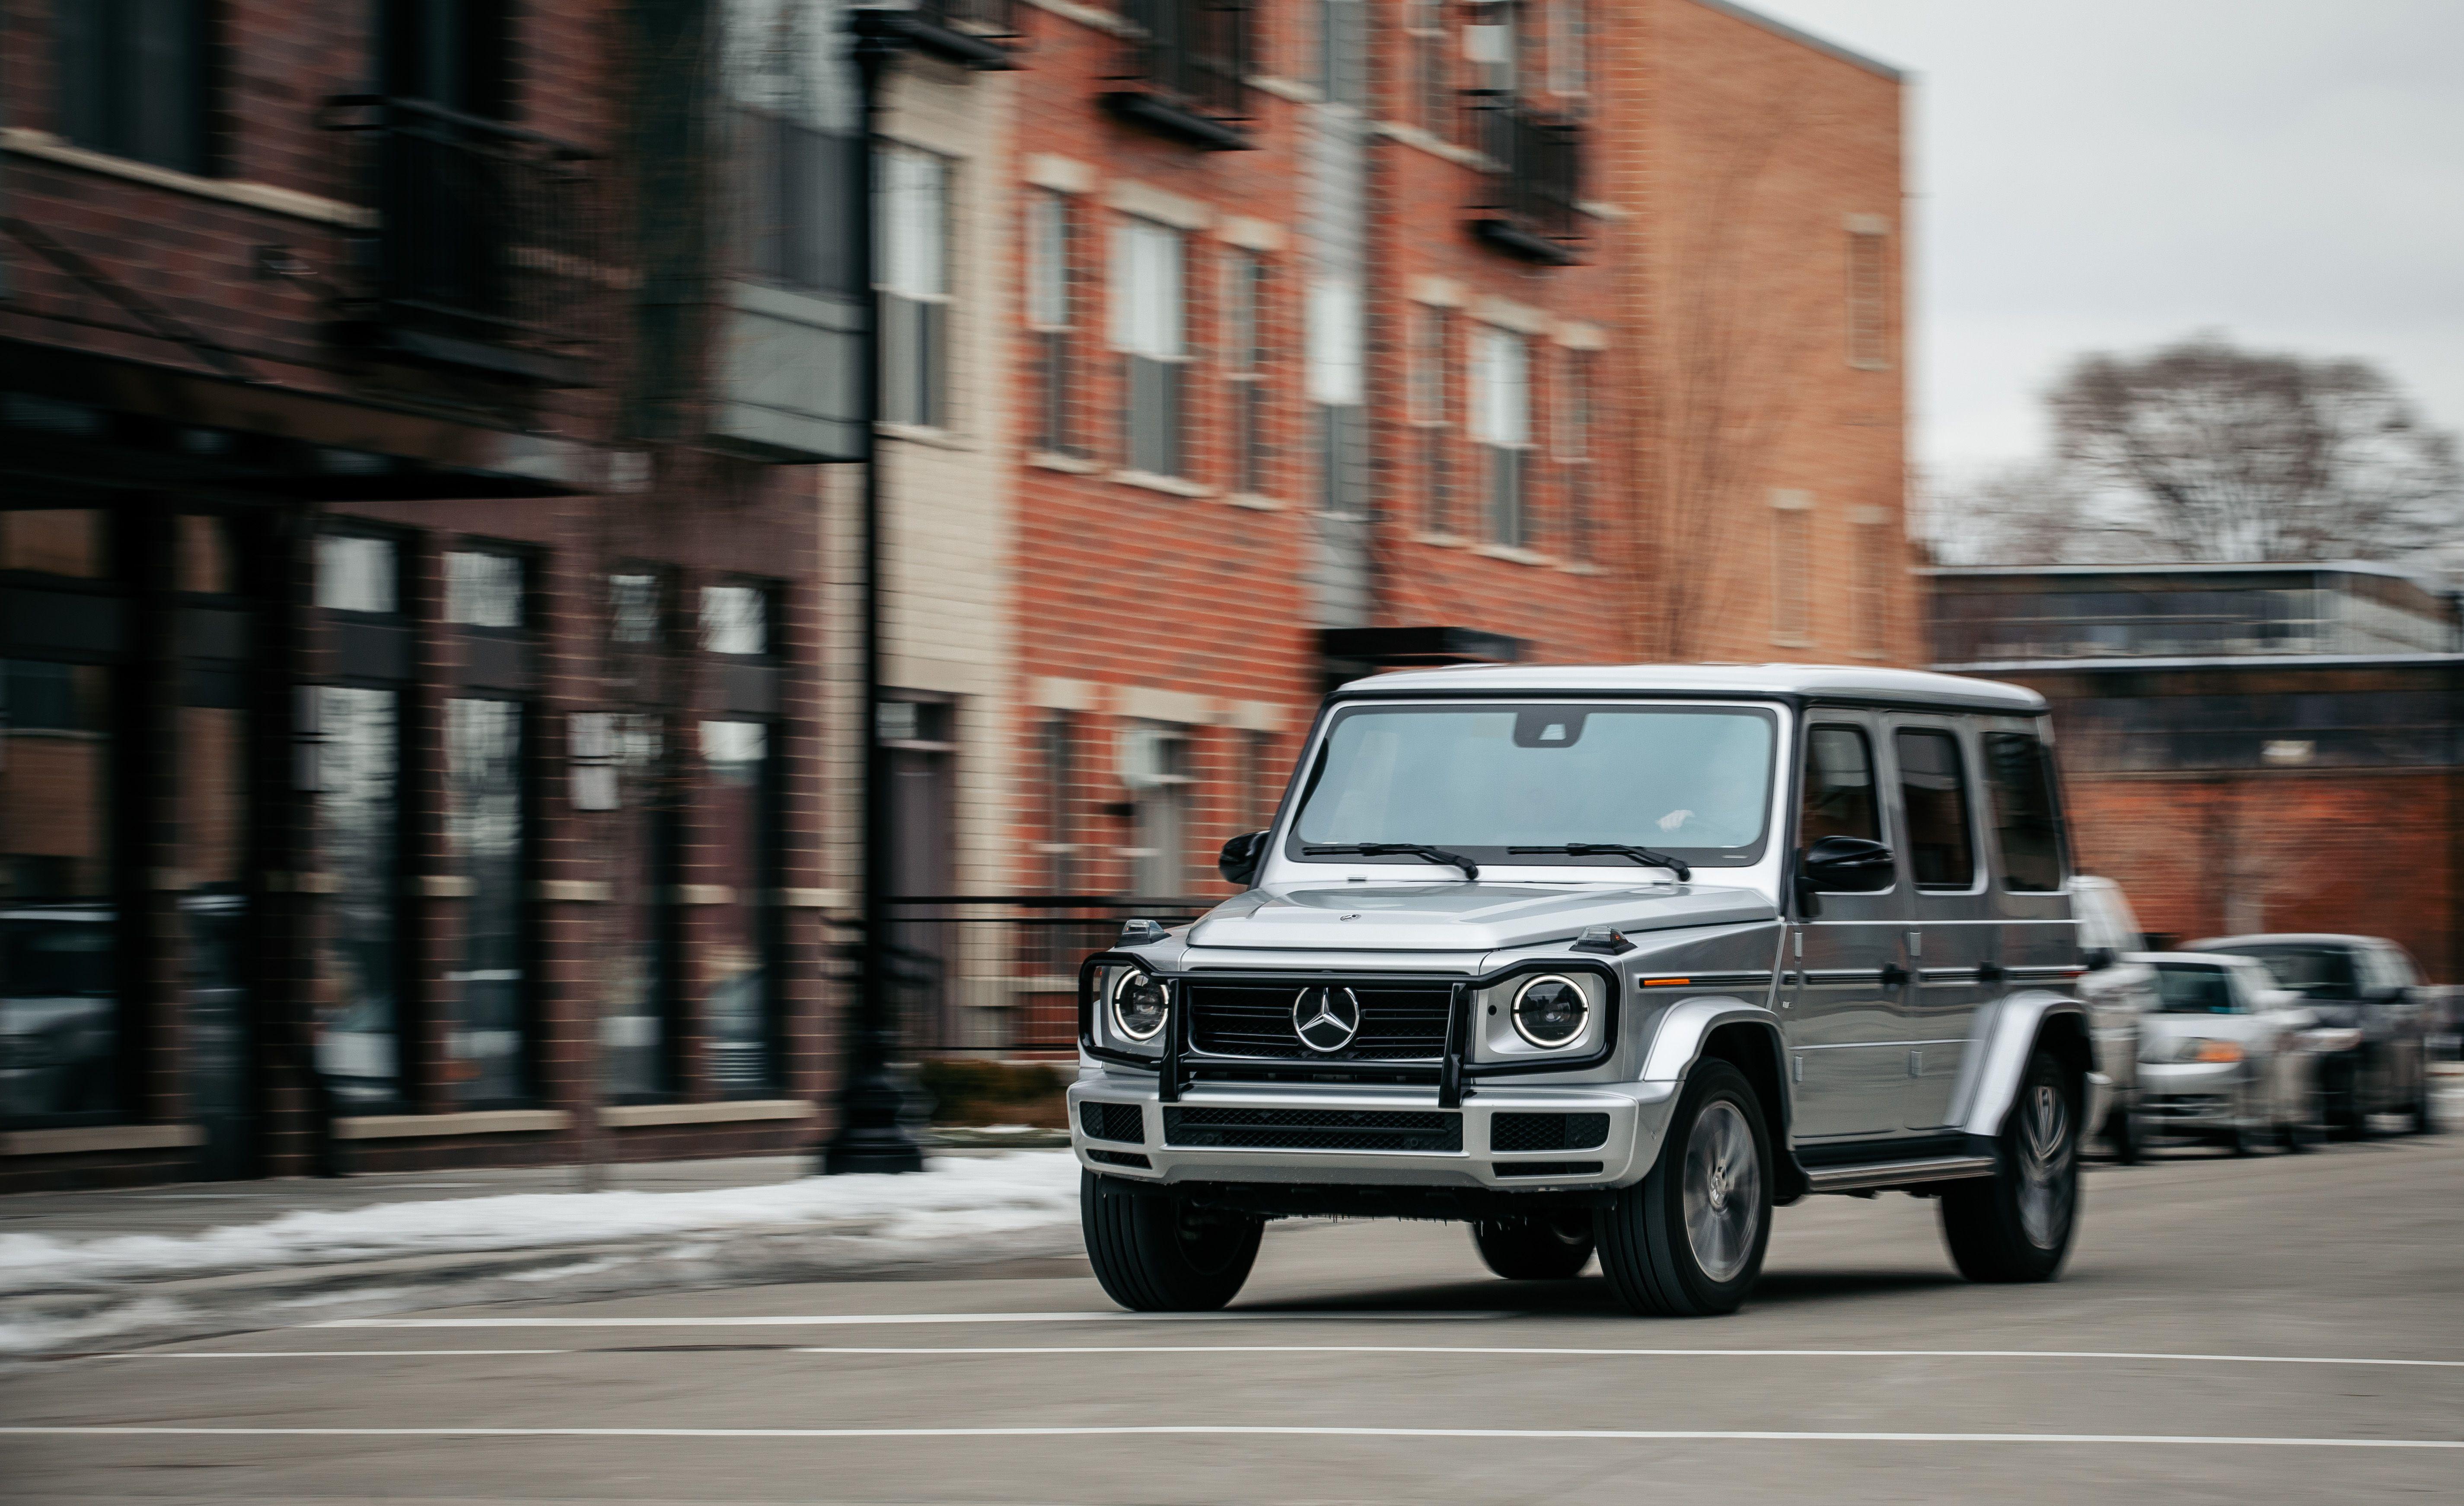 2019 Mercedes Benz G Class Remains Wonderfully Outrageous